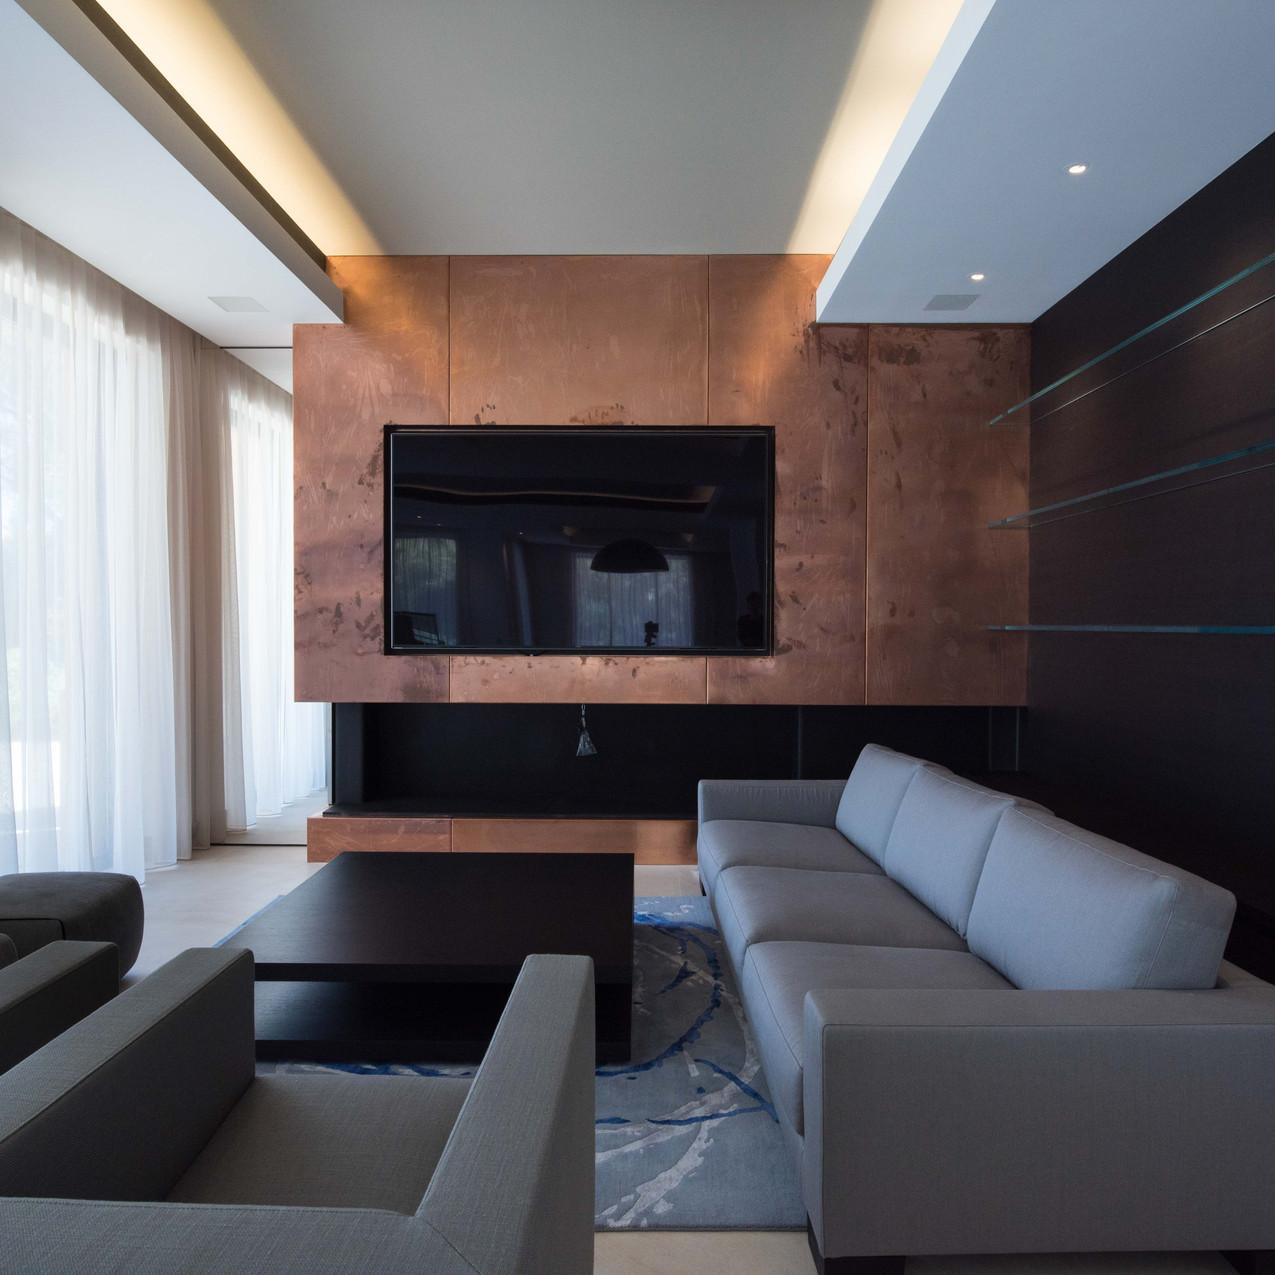 photographe architecture nice france french riviera paca cote dazur interieur-58